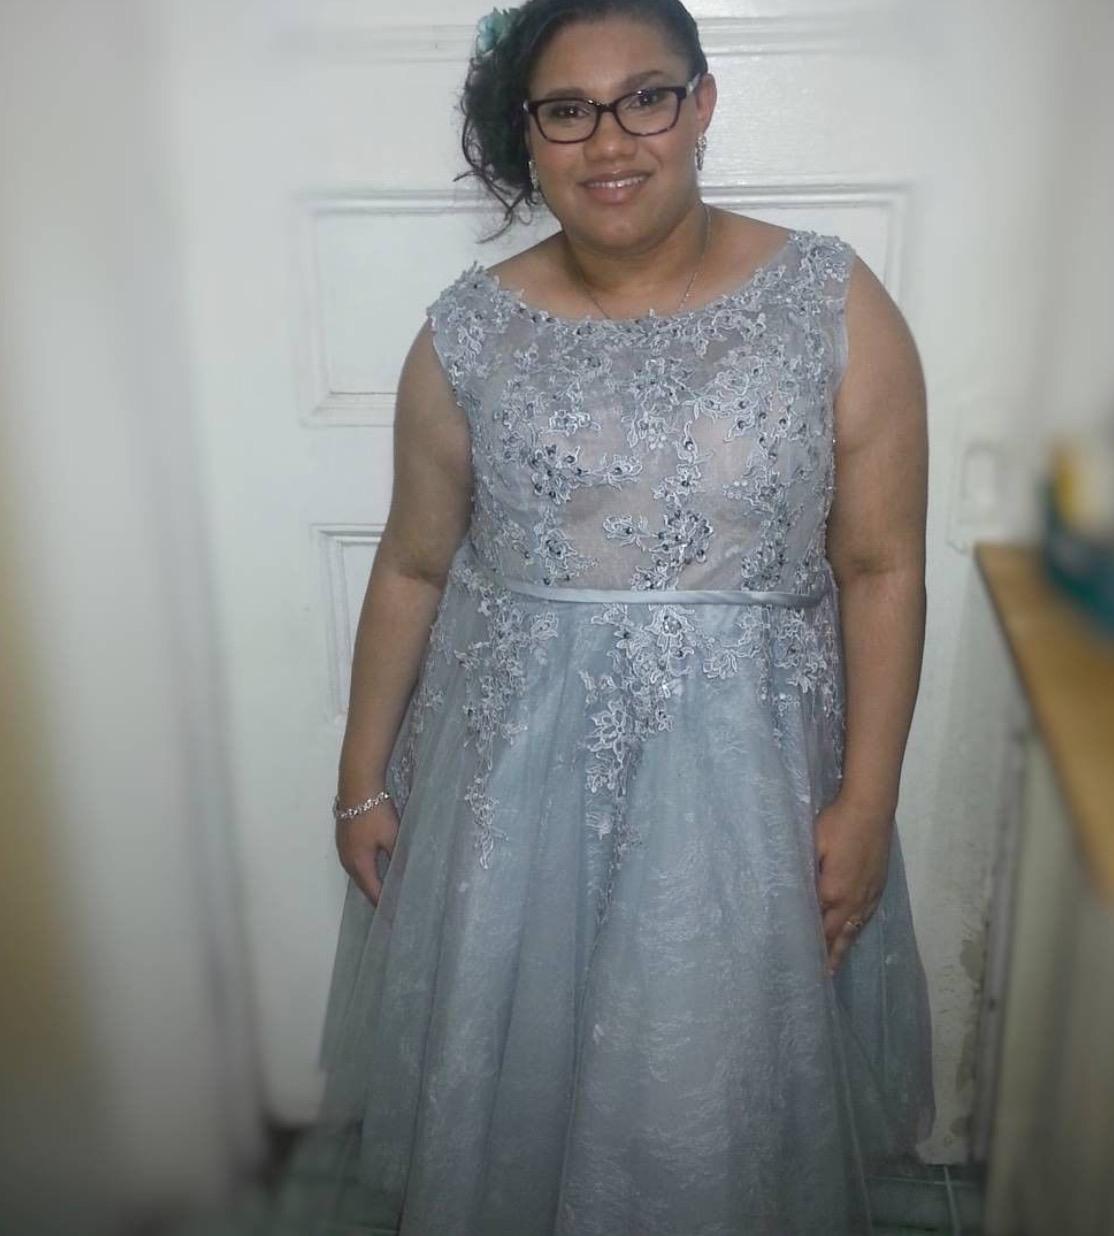 Made to Measure Dresses - Do They Work? | Retro Dresses & Vintage ...